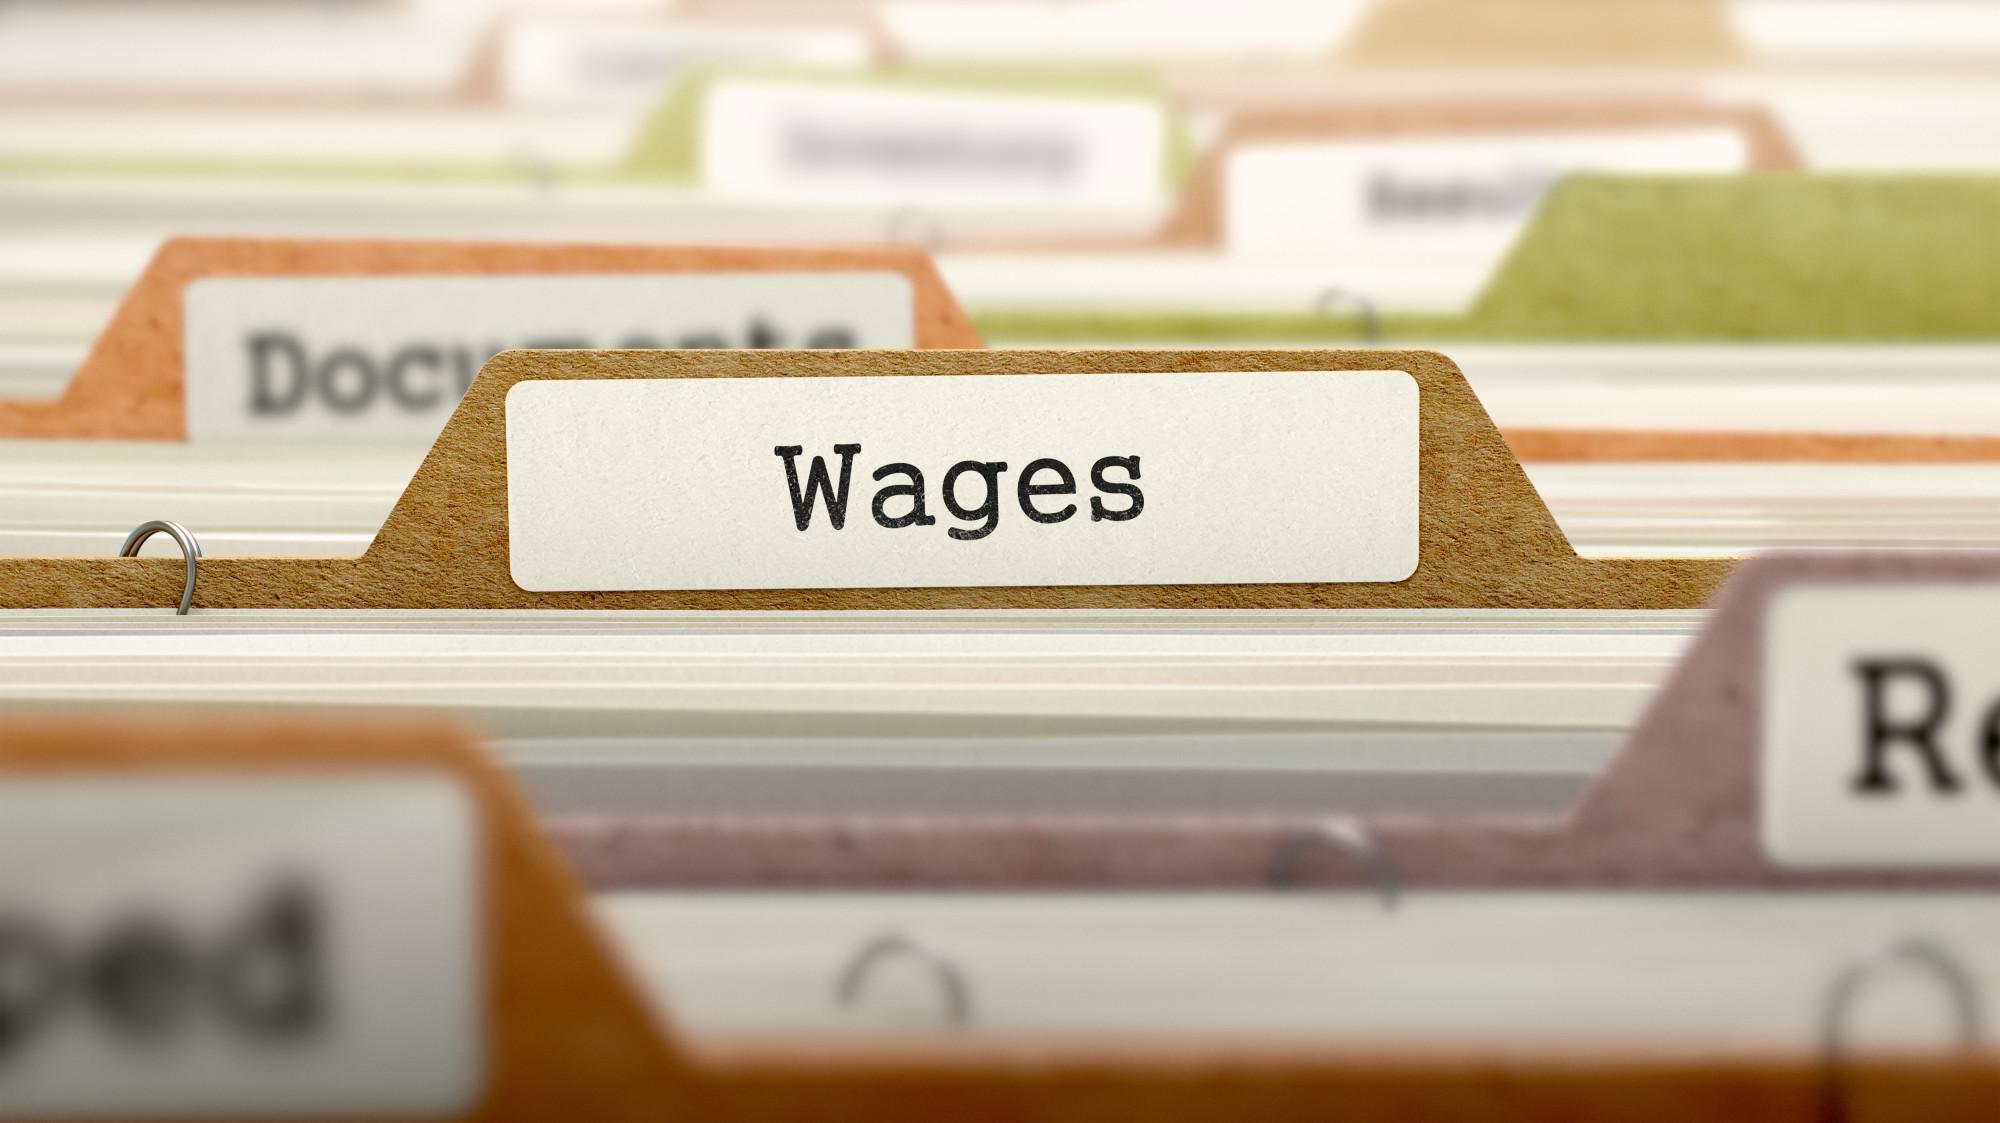 wages folder